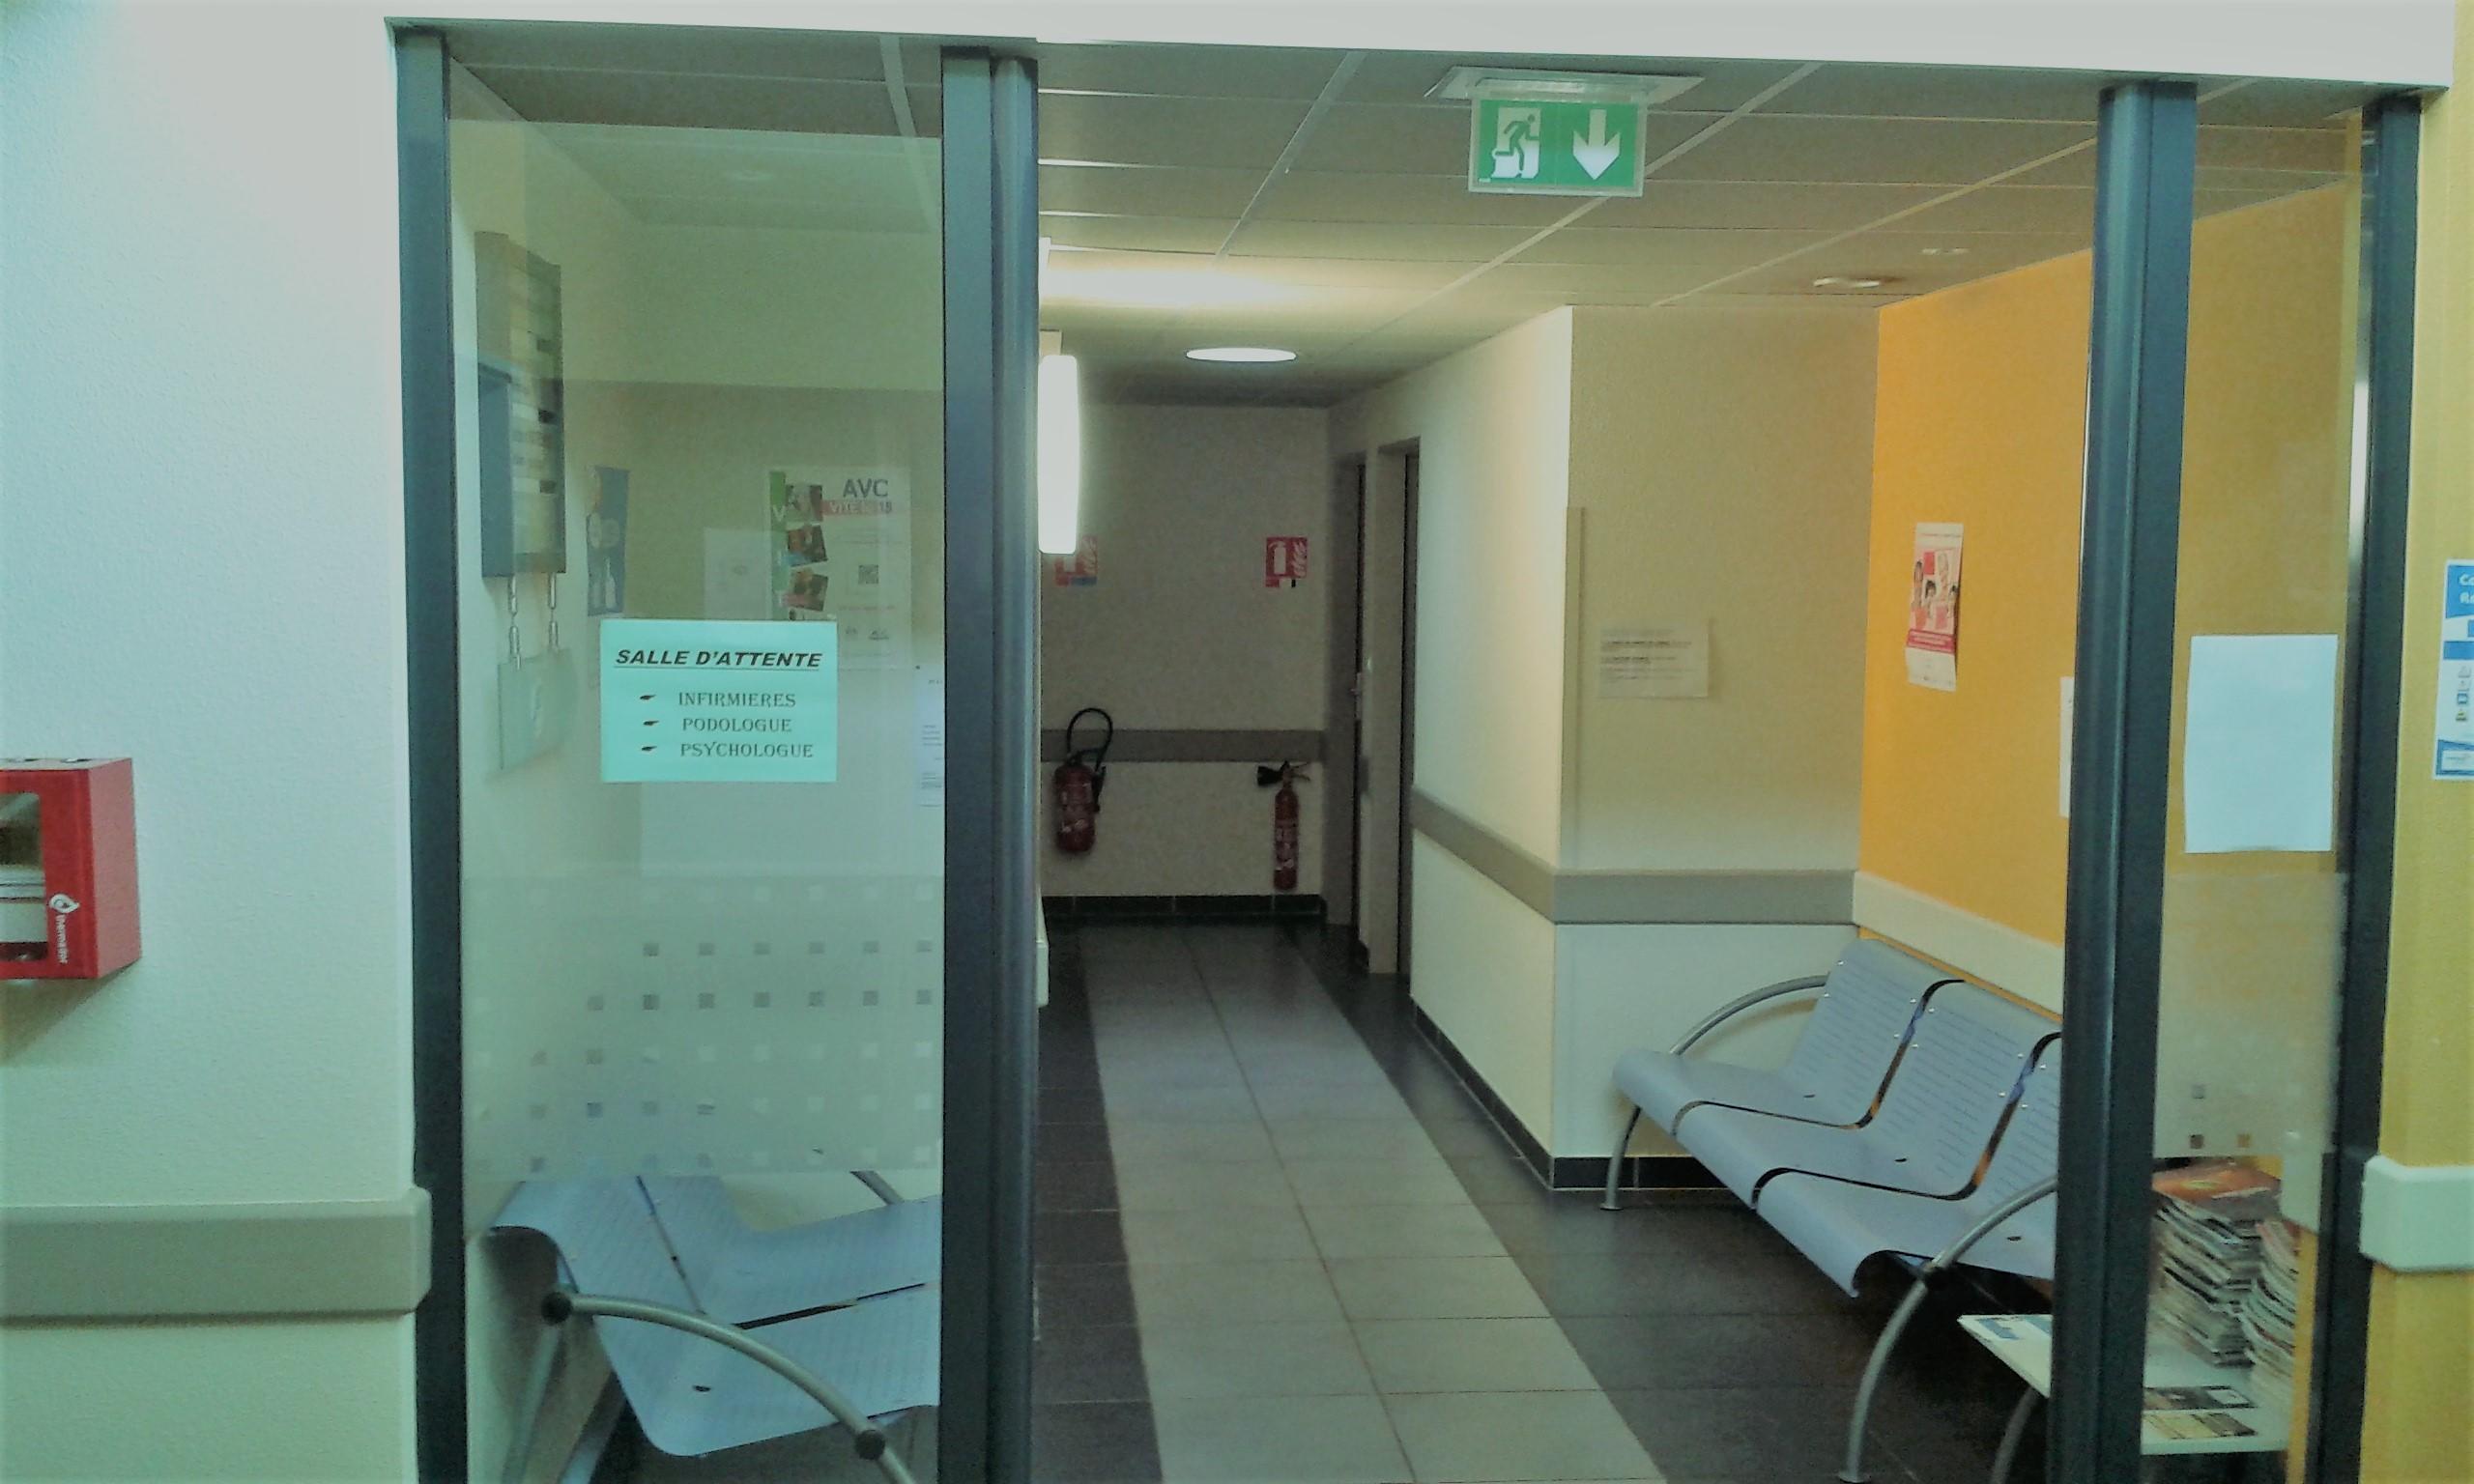 salle attente 1 inf,podo,psy.jpg